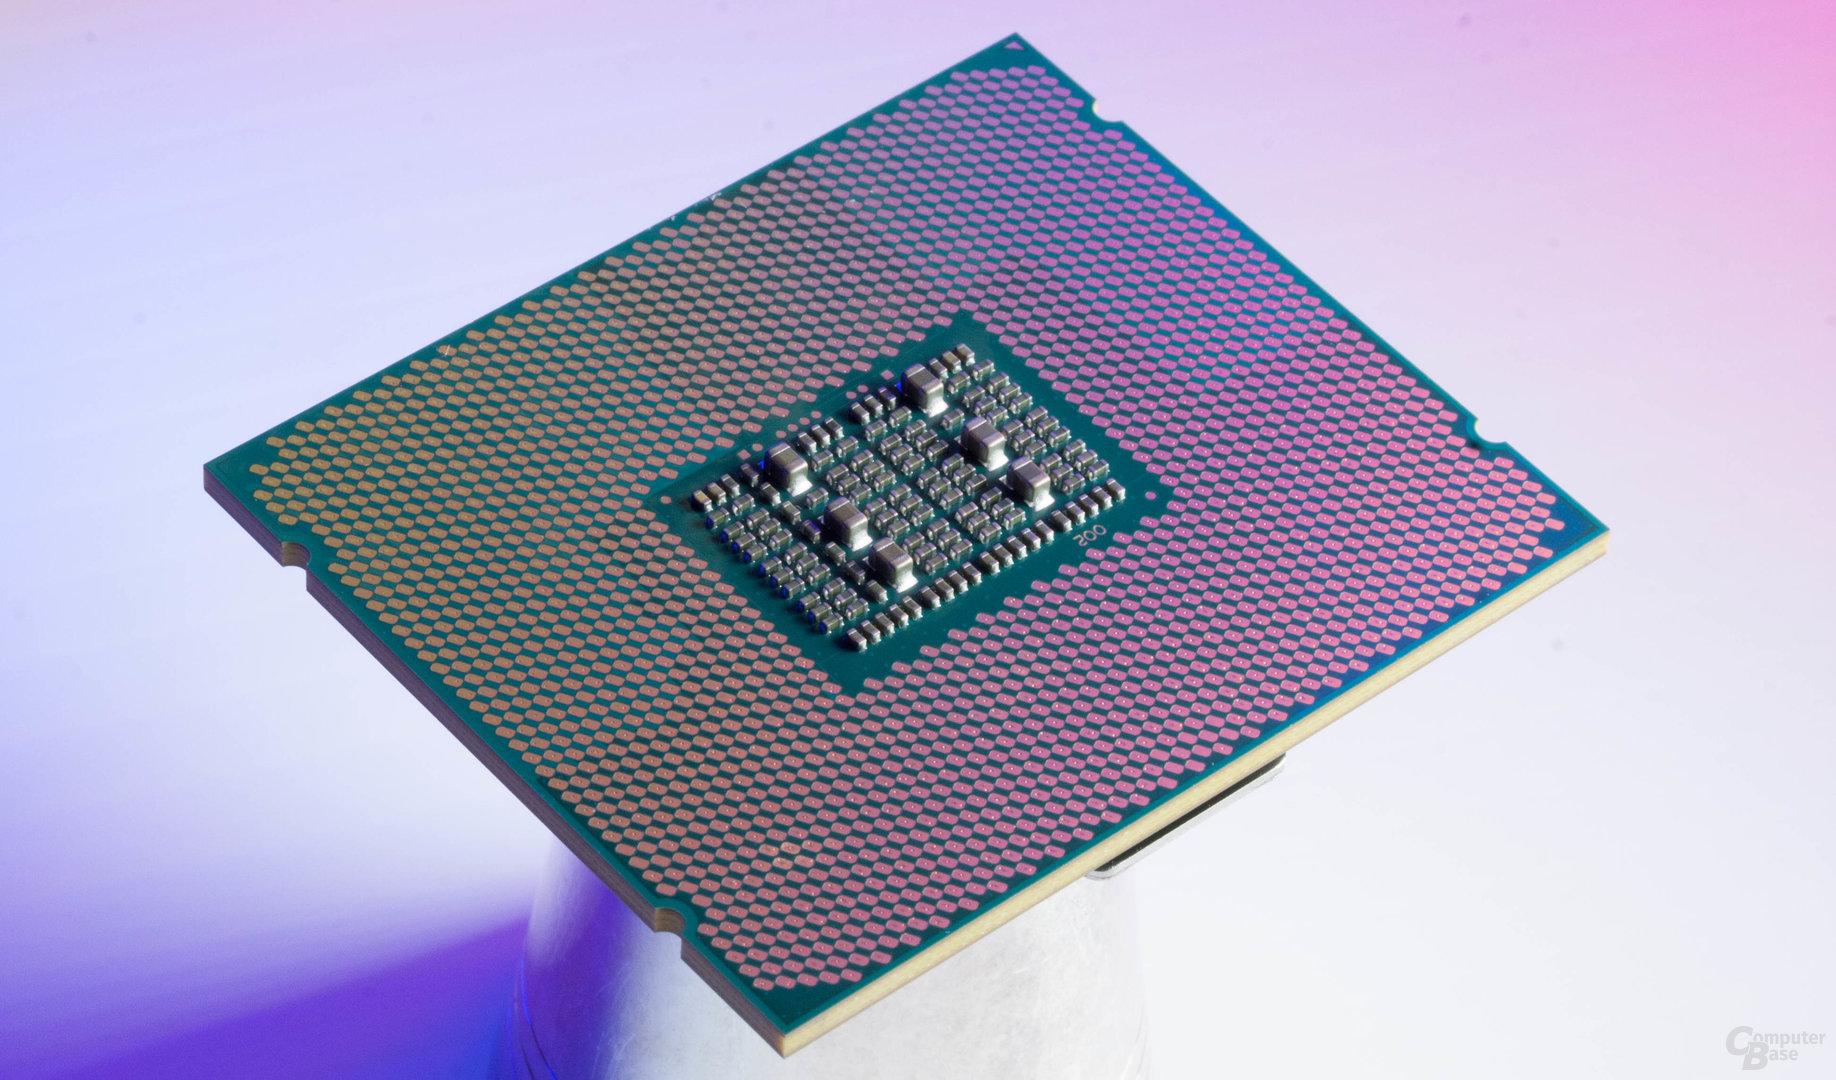 Intel Xeon E7 v2 Package